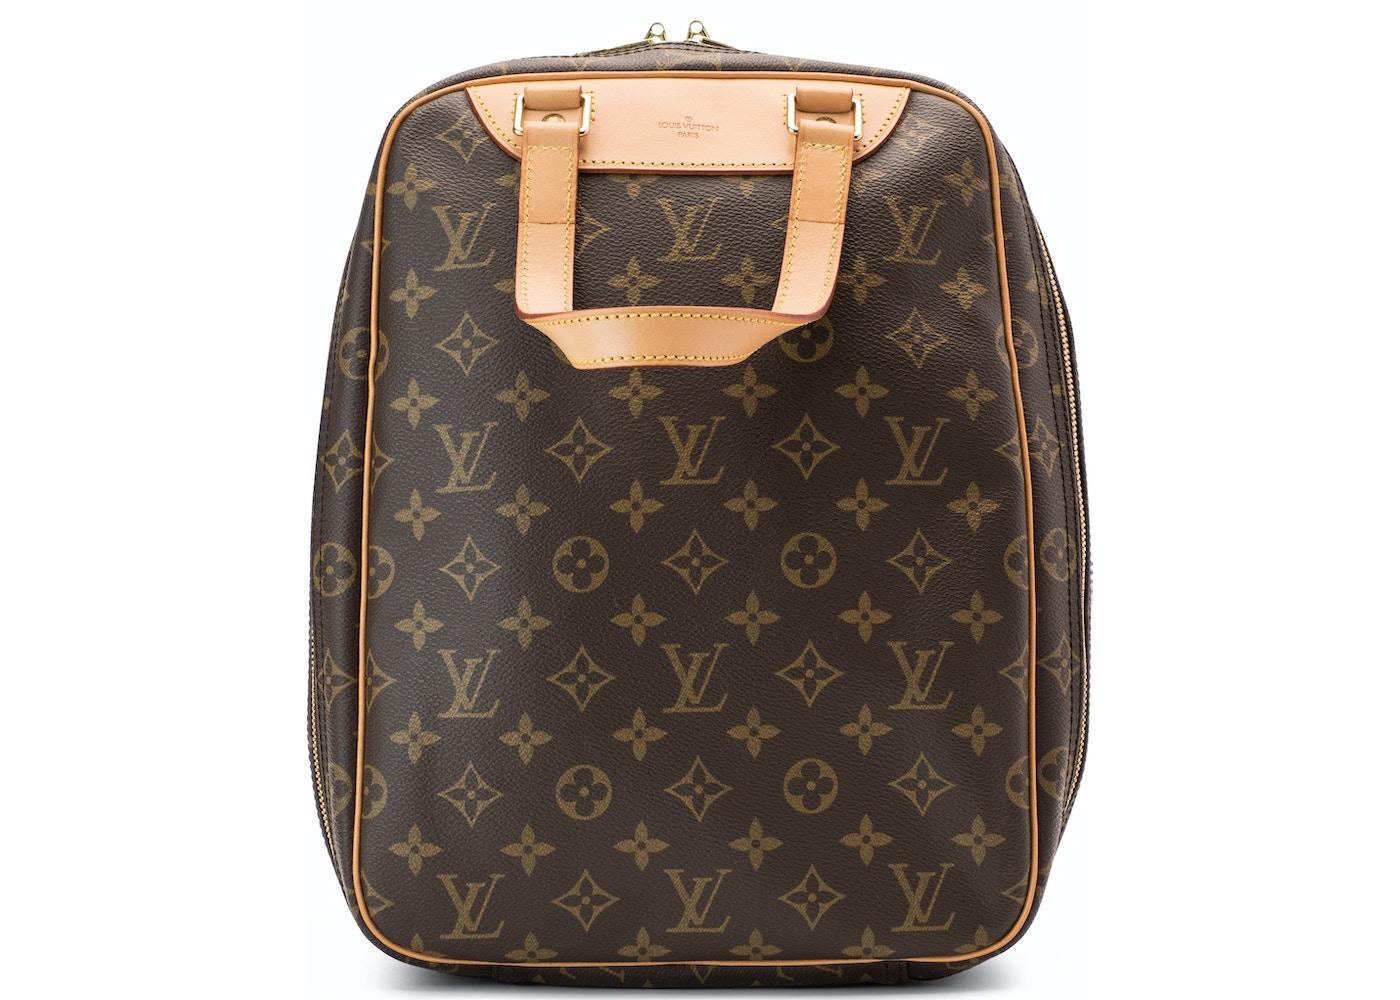 74683703 Louis Vuitton Excursion Monogram Brown. Monogram Brown